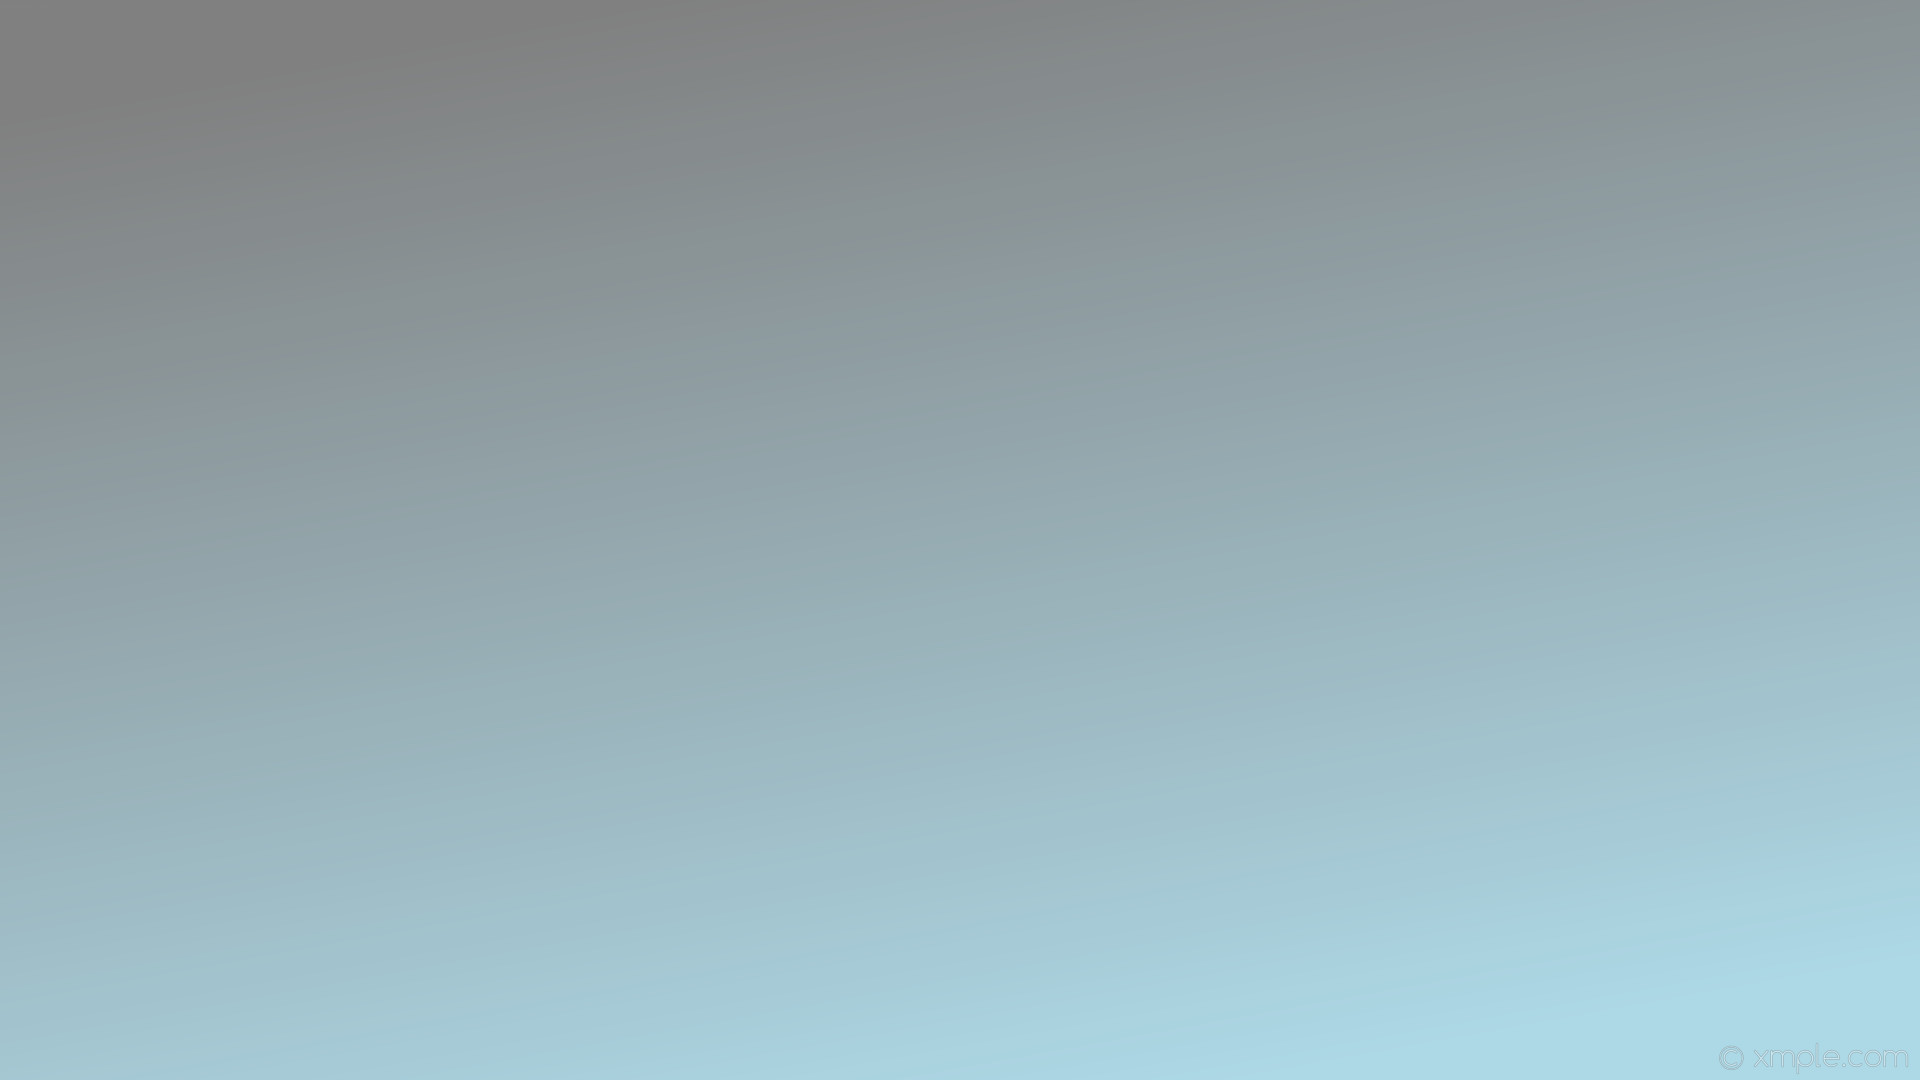 wallpaper grey blue gradient linear light blue gray #add8e6 #808080 300°